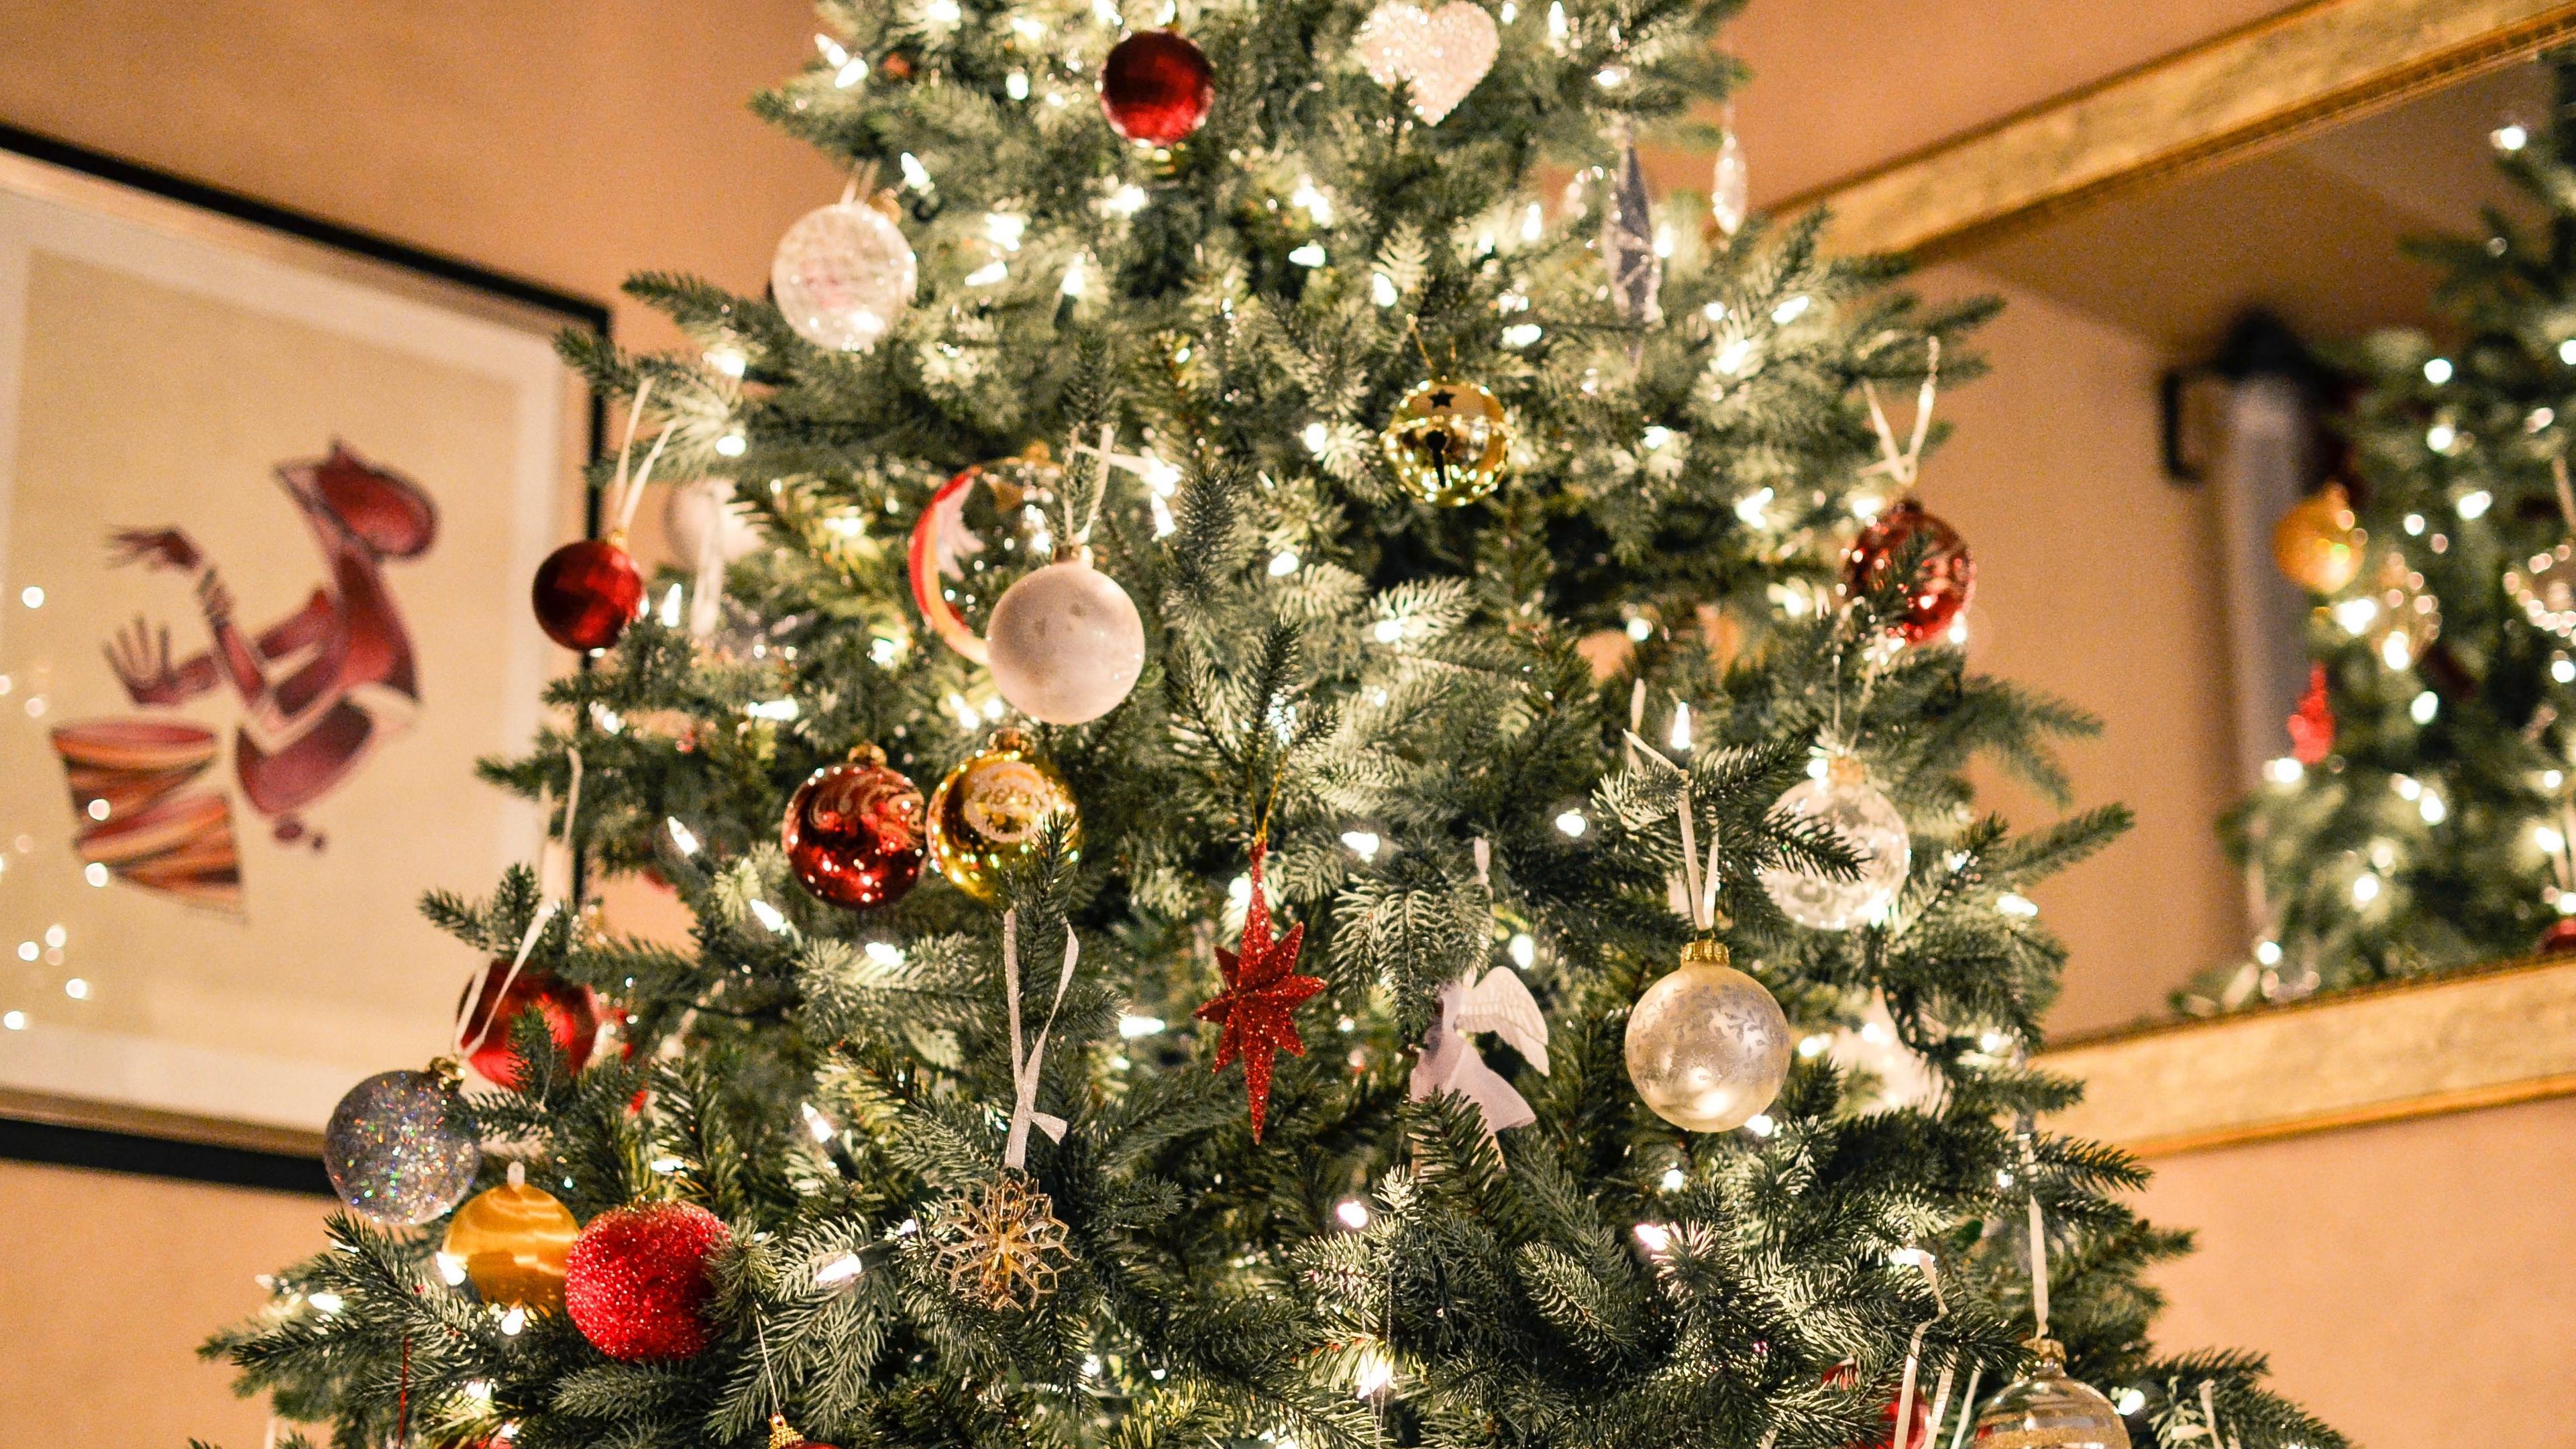 christmas tree ornaments garlands 4k 1538344616 - christmas tree, ornaments, garlands 4k - ornaments, garlands, christmas tree